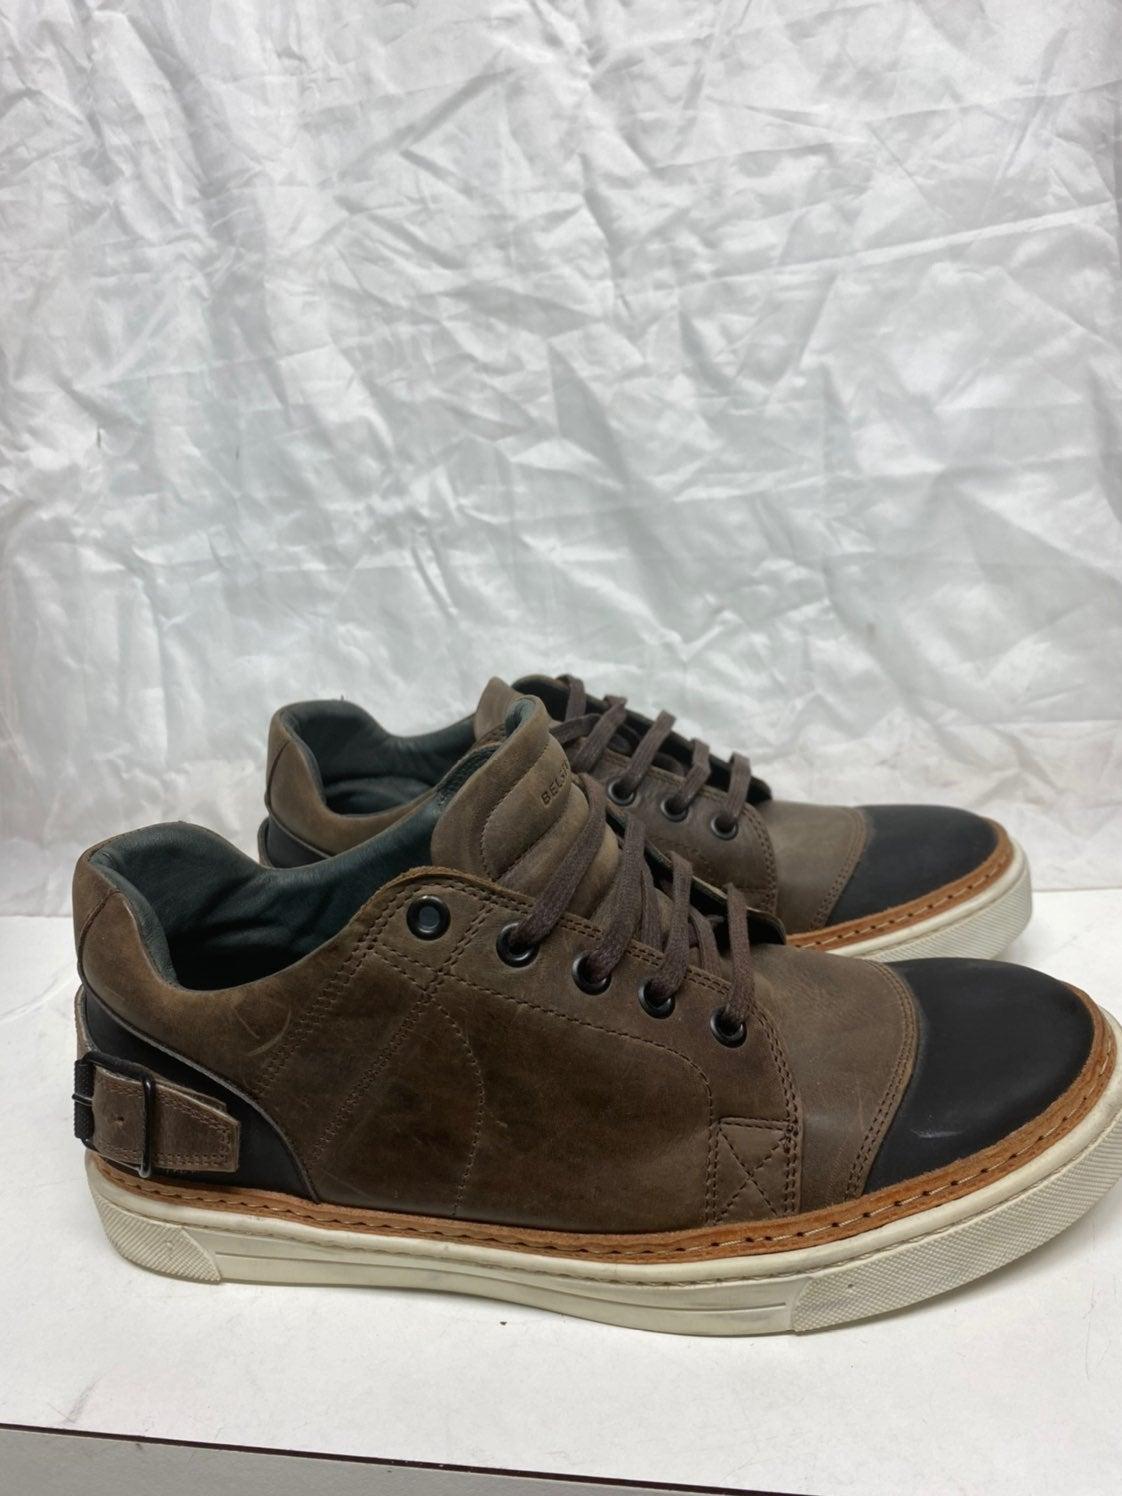 Belstaff Brown lowtop laceup sneakers